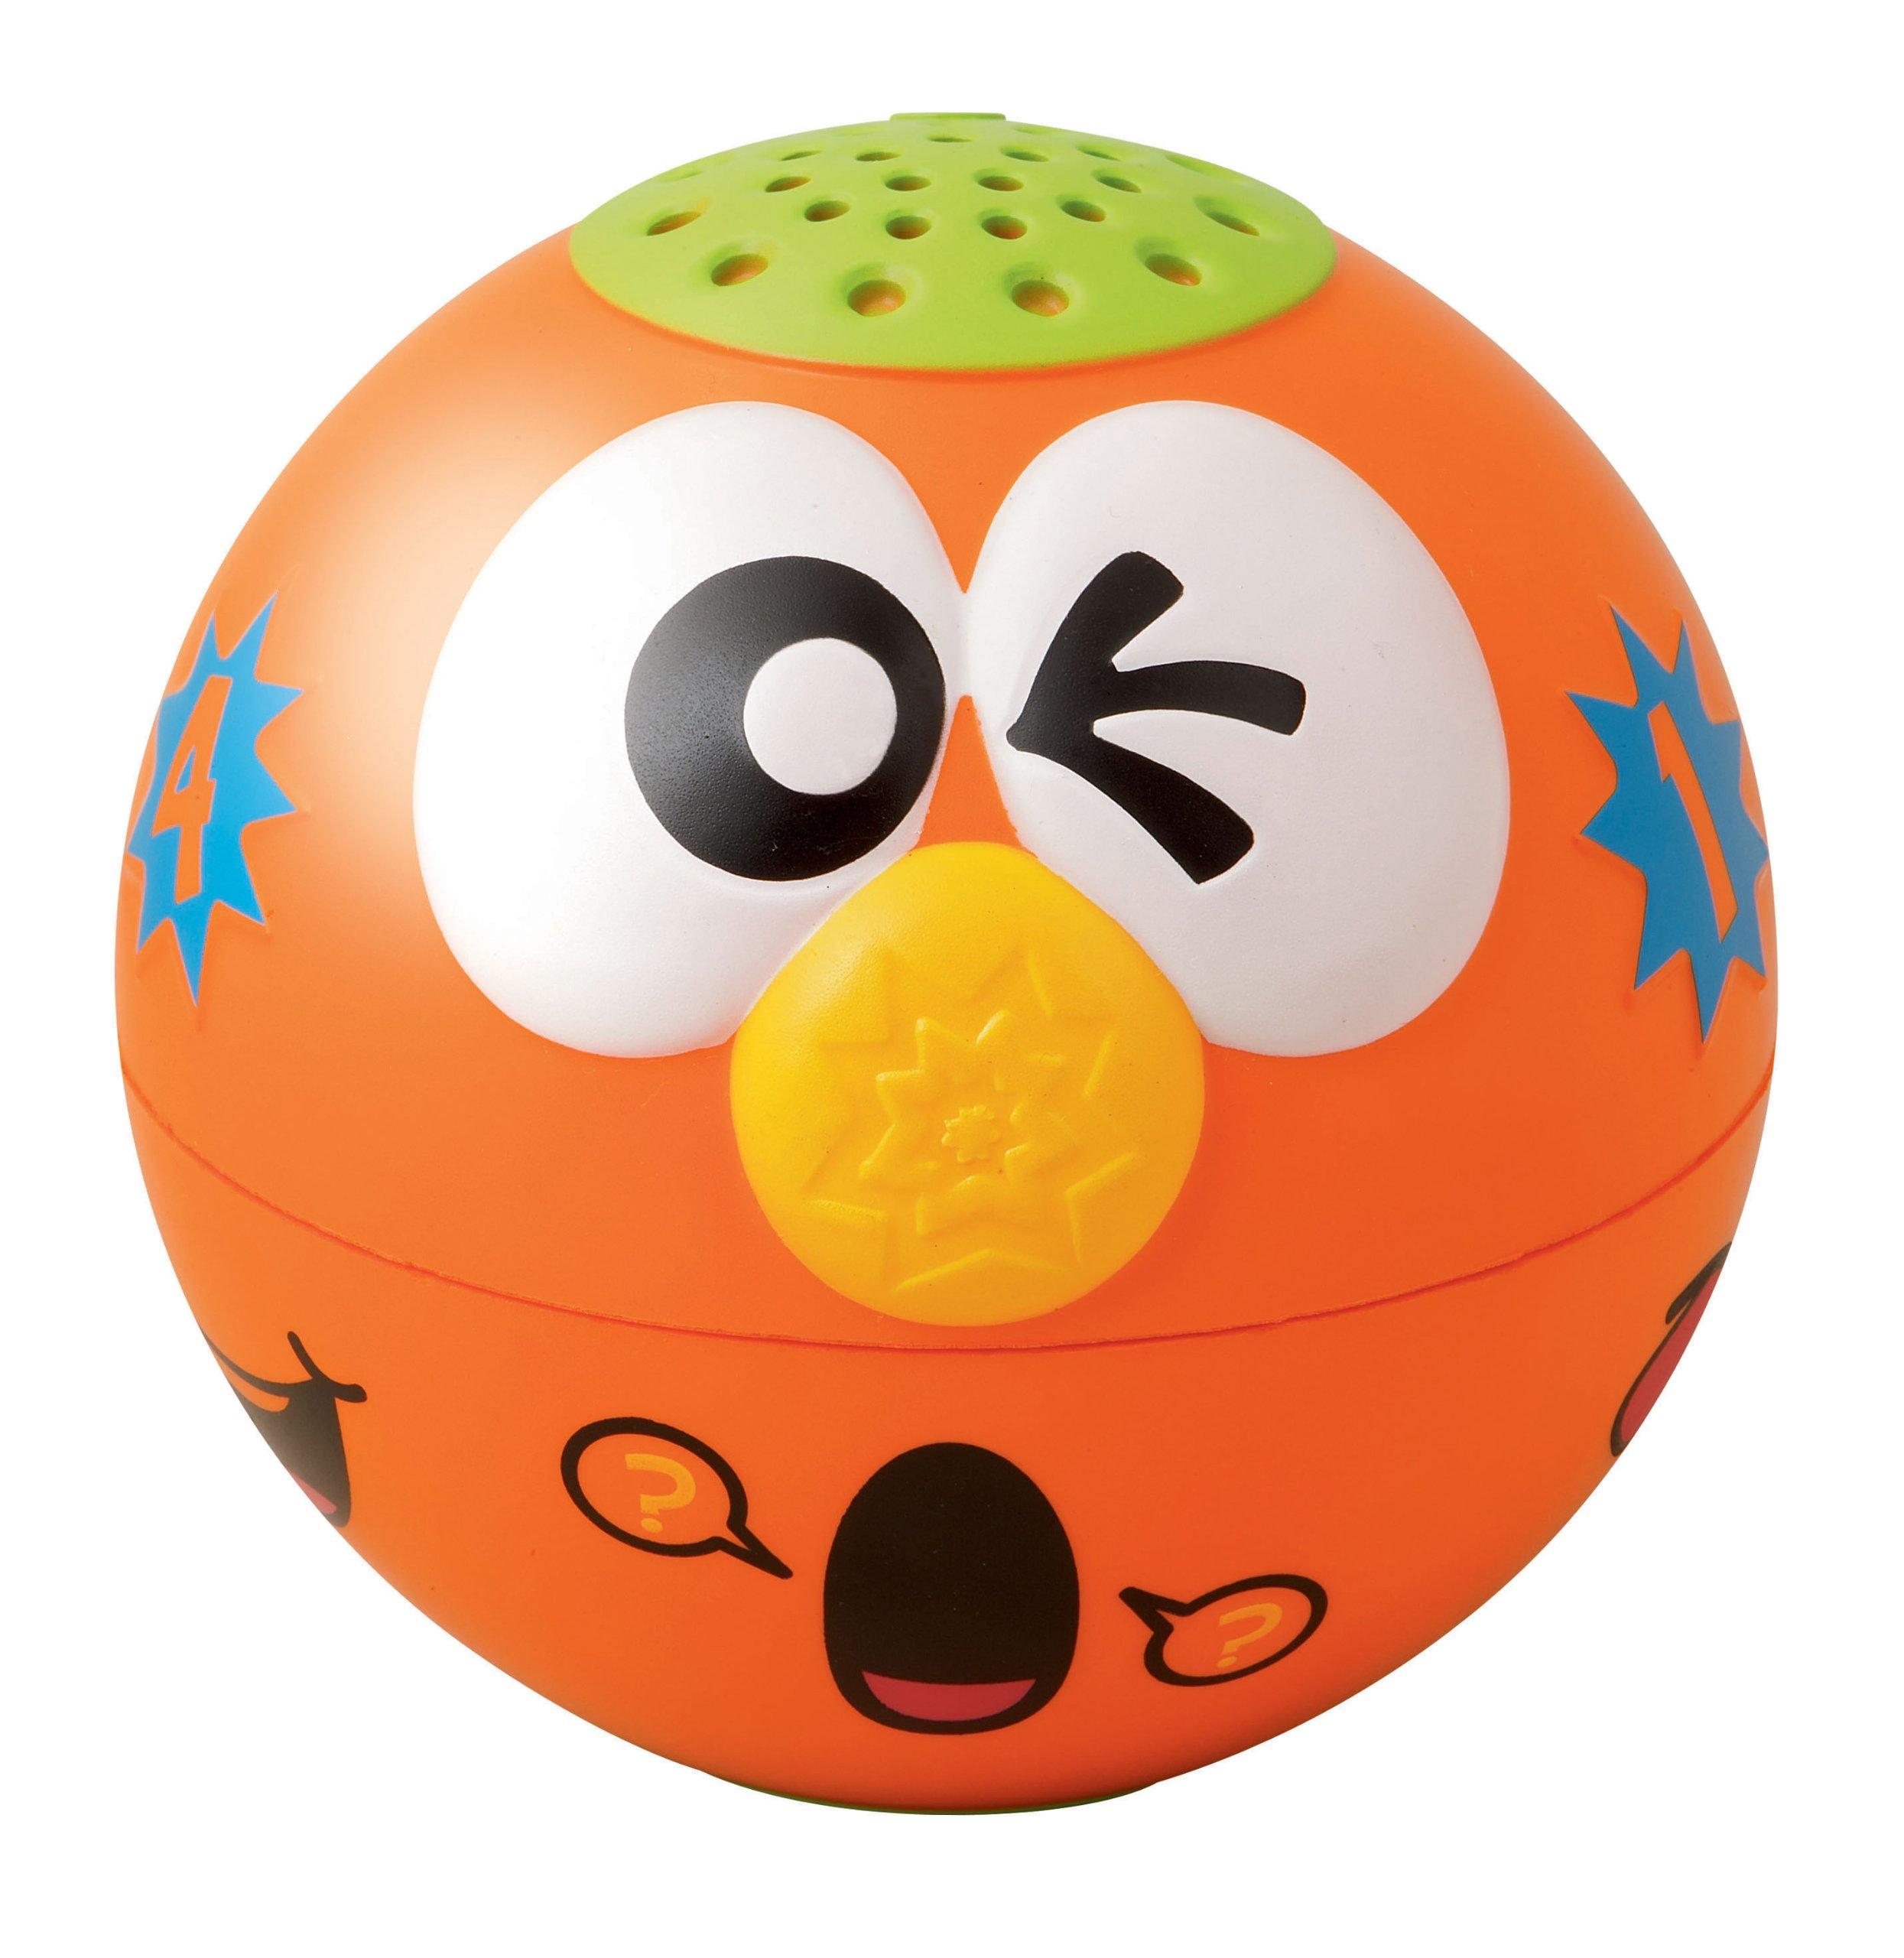 VTech Brilli The Imagination Ball - Orange by VTech (Image #4)